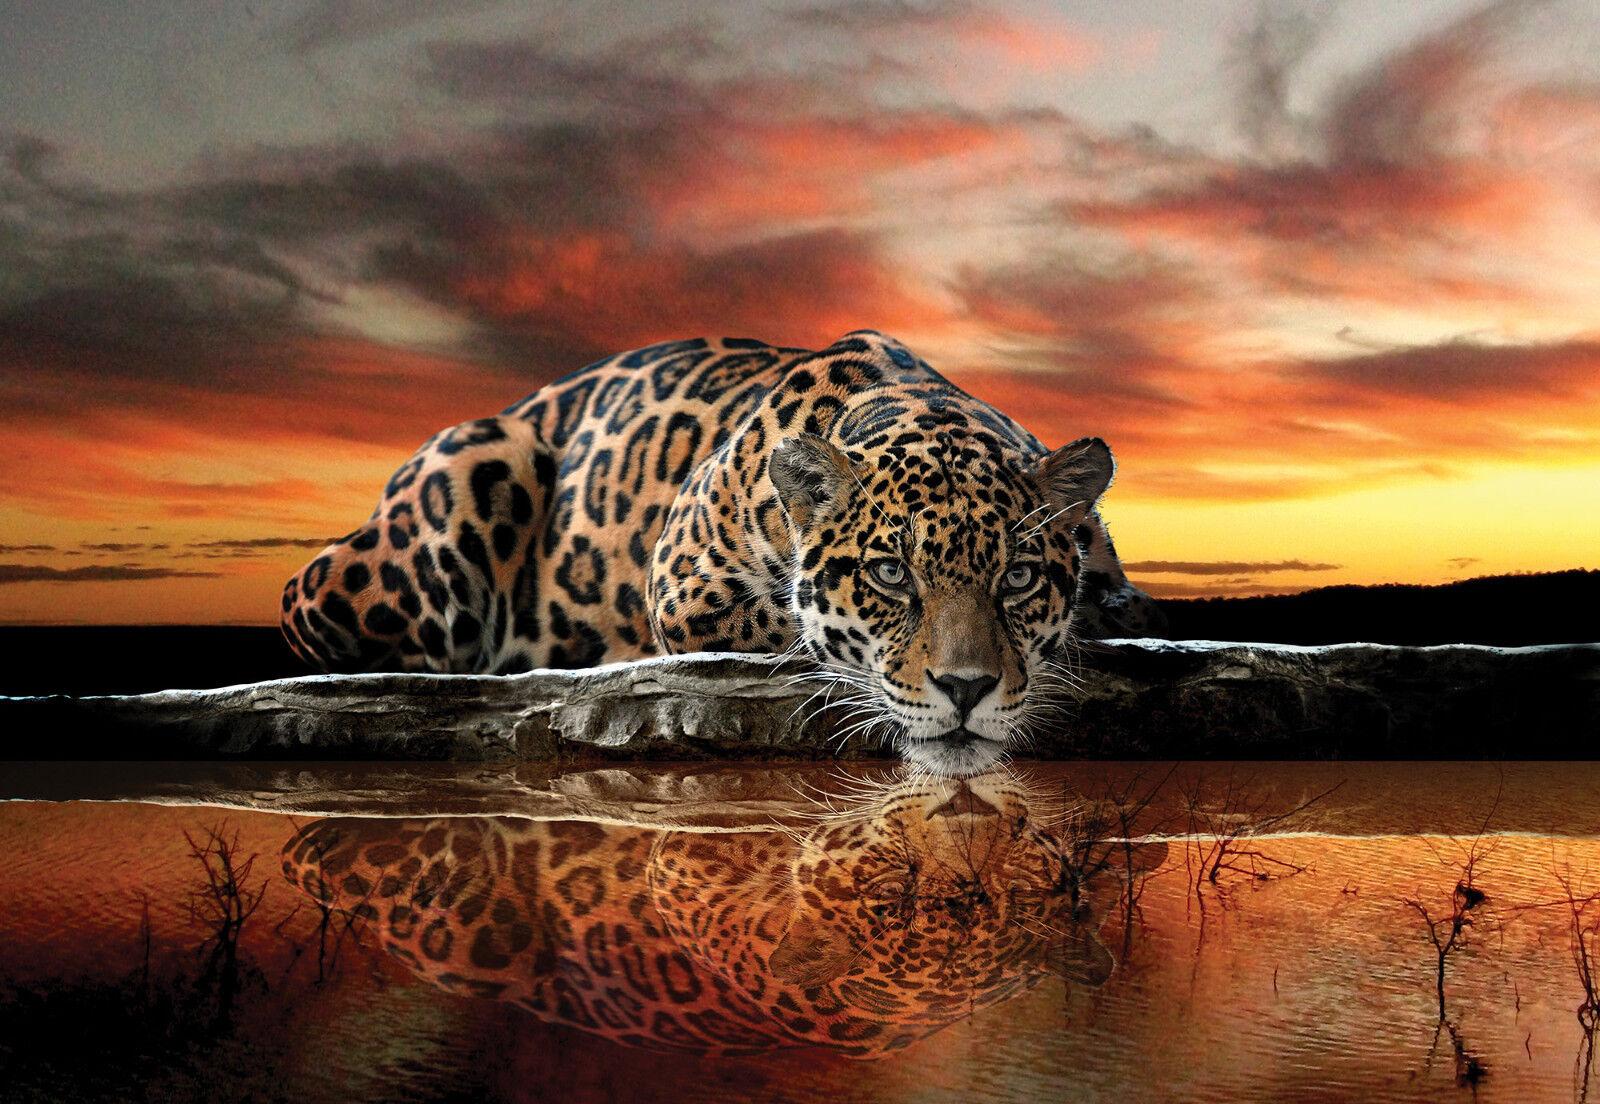 VLIES Fototapete-LEOPARD-(126)-Raubtiere Katze Tiger Löwe Jaguar Panther Mural